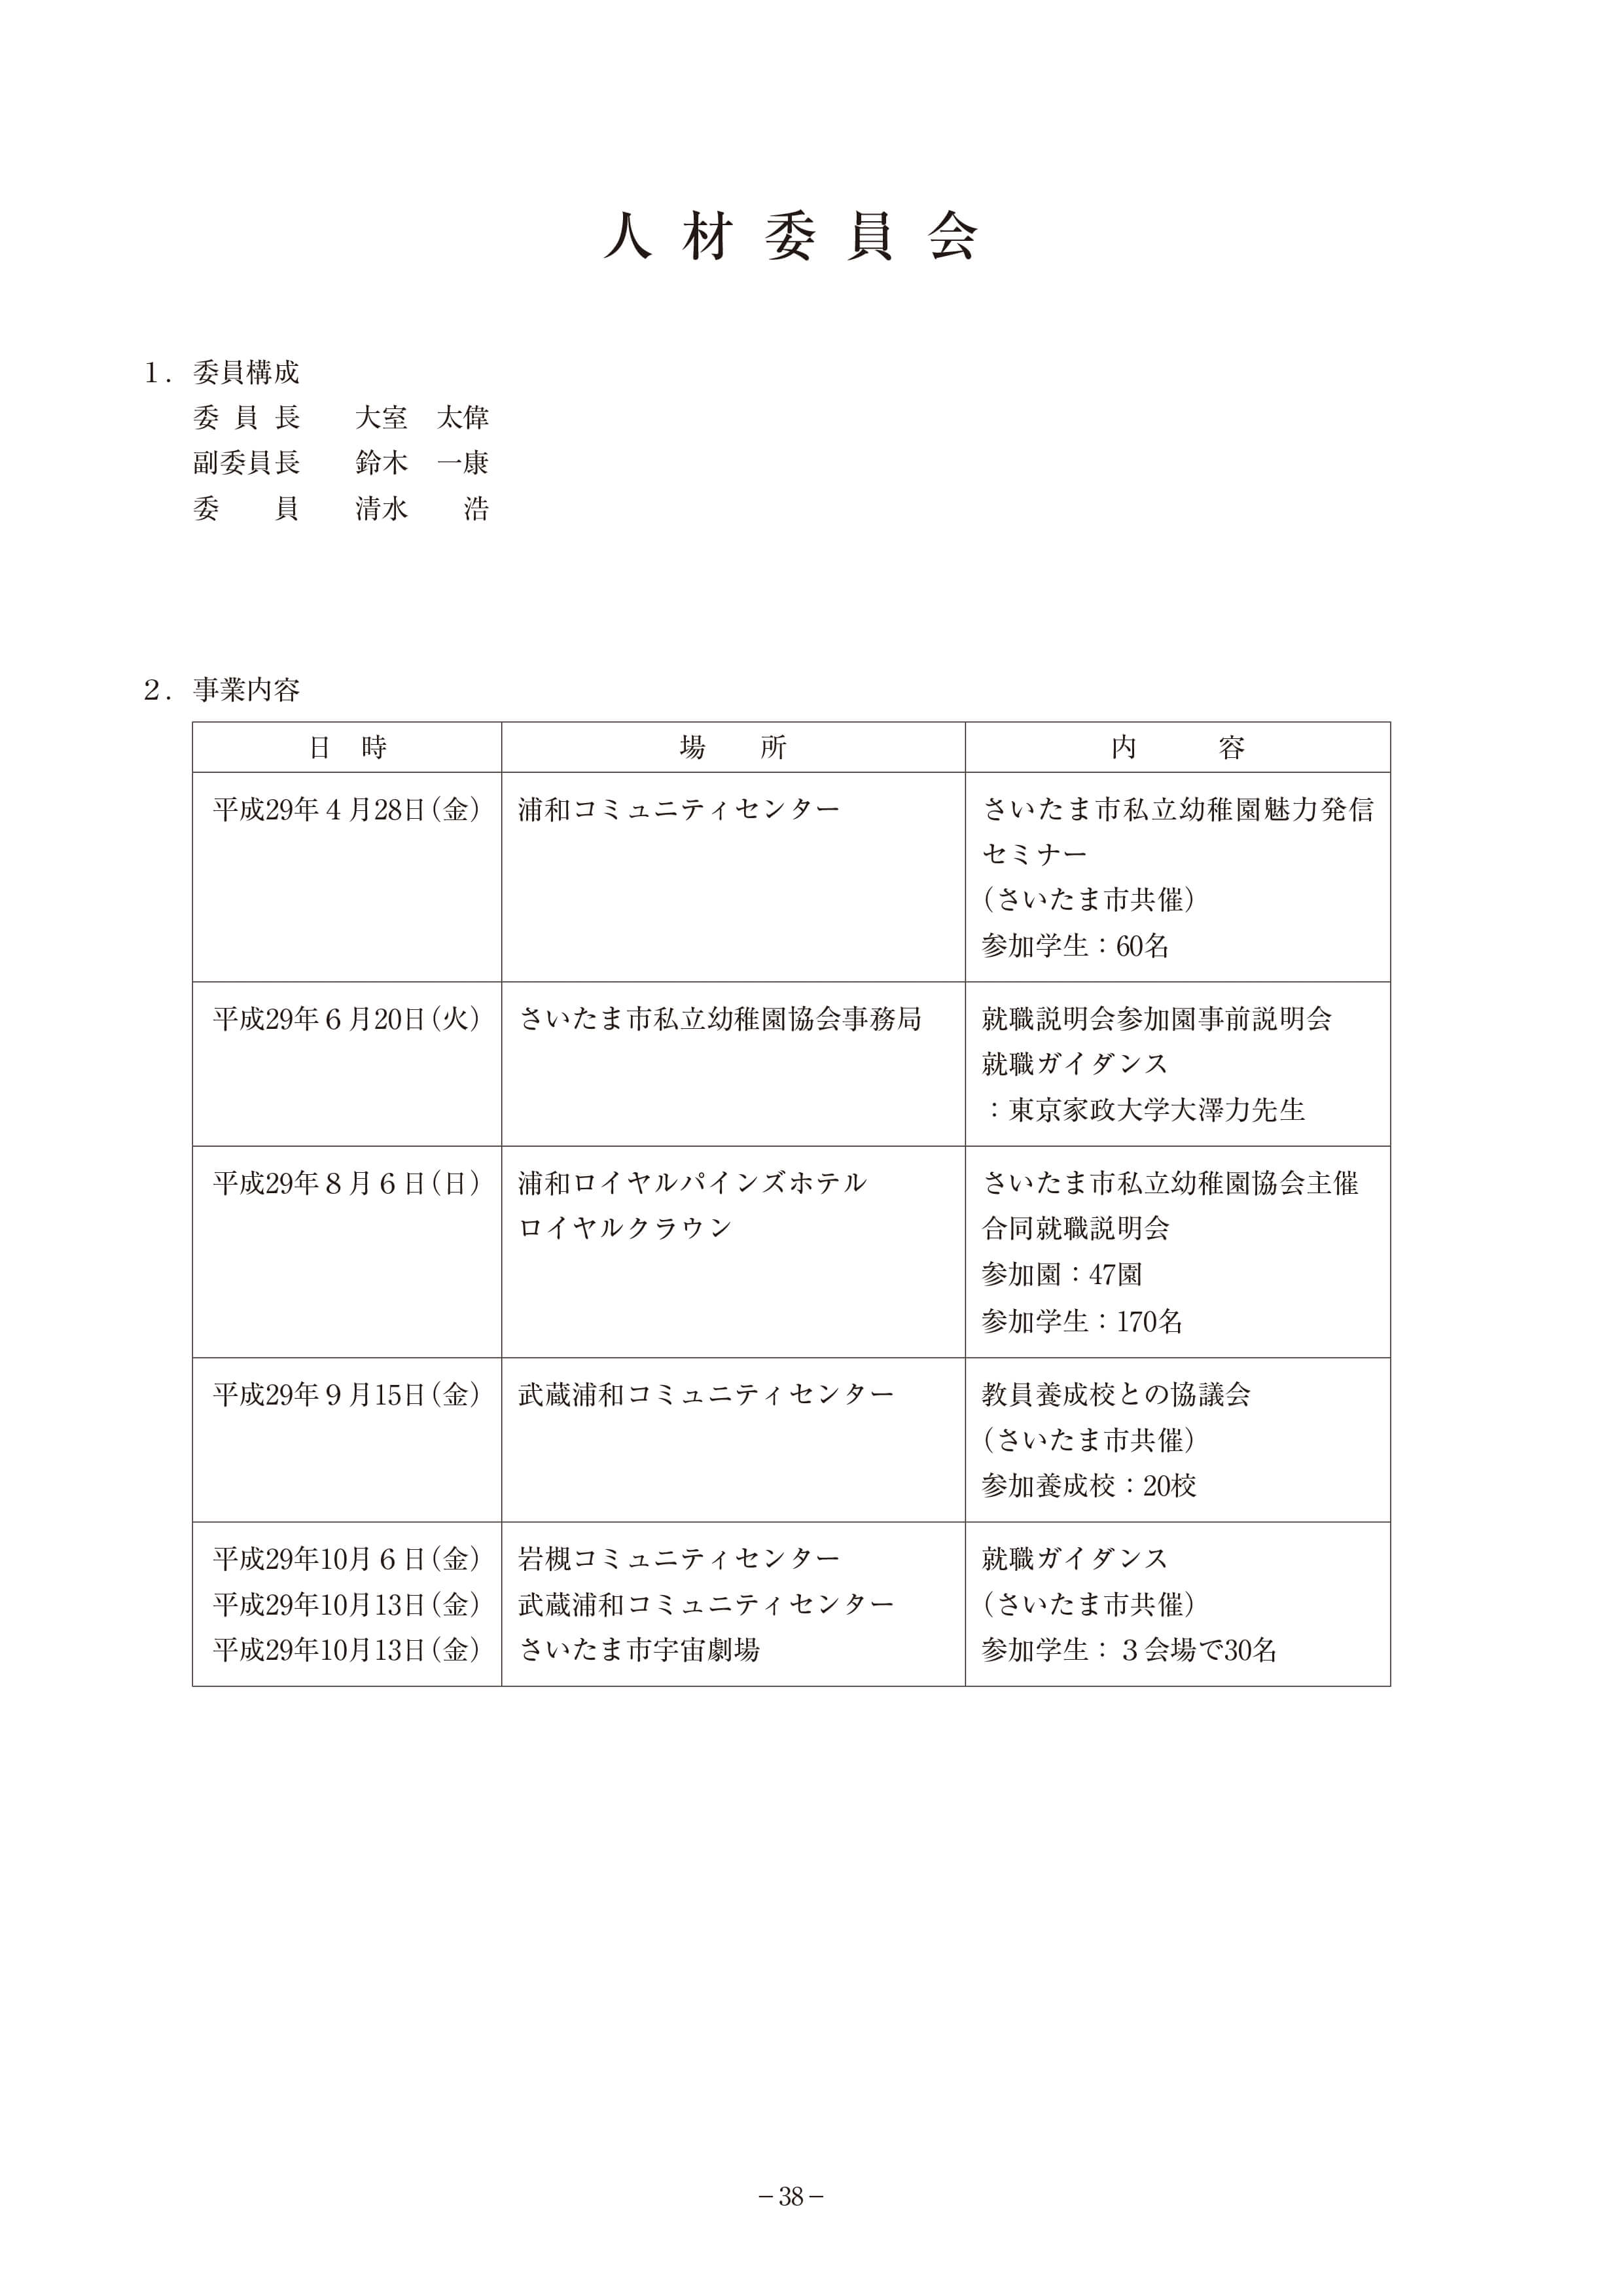 人材委員会の活動報告